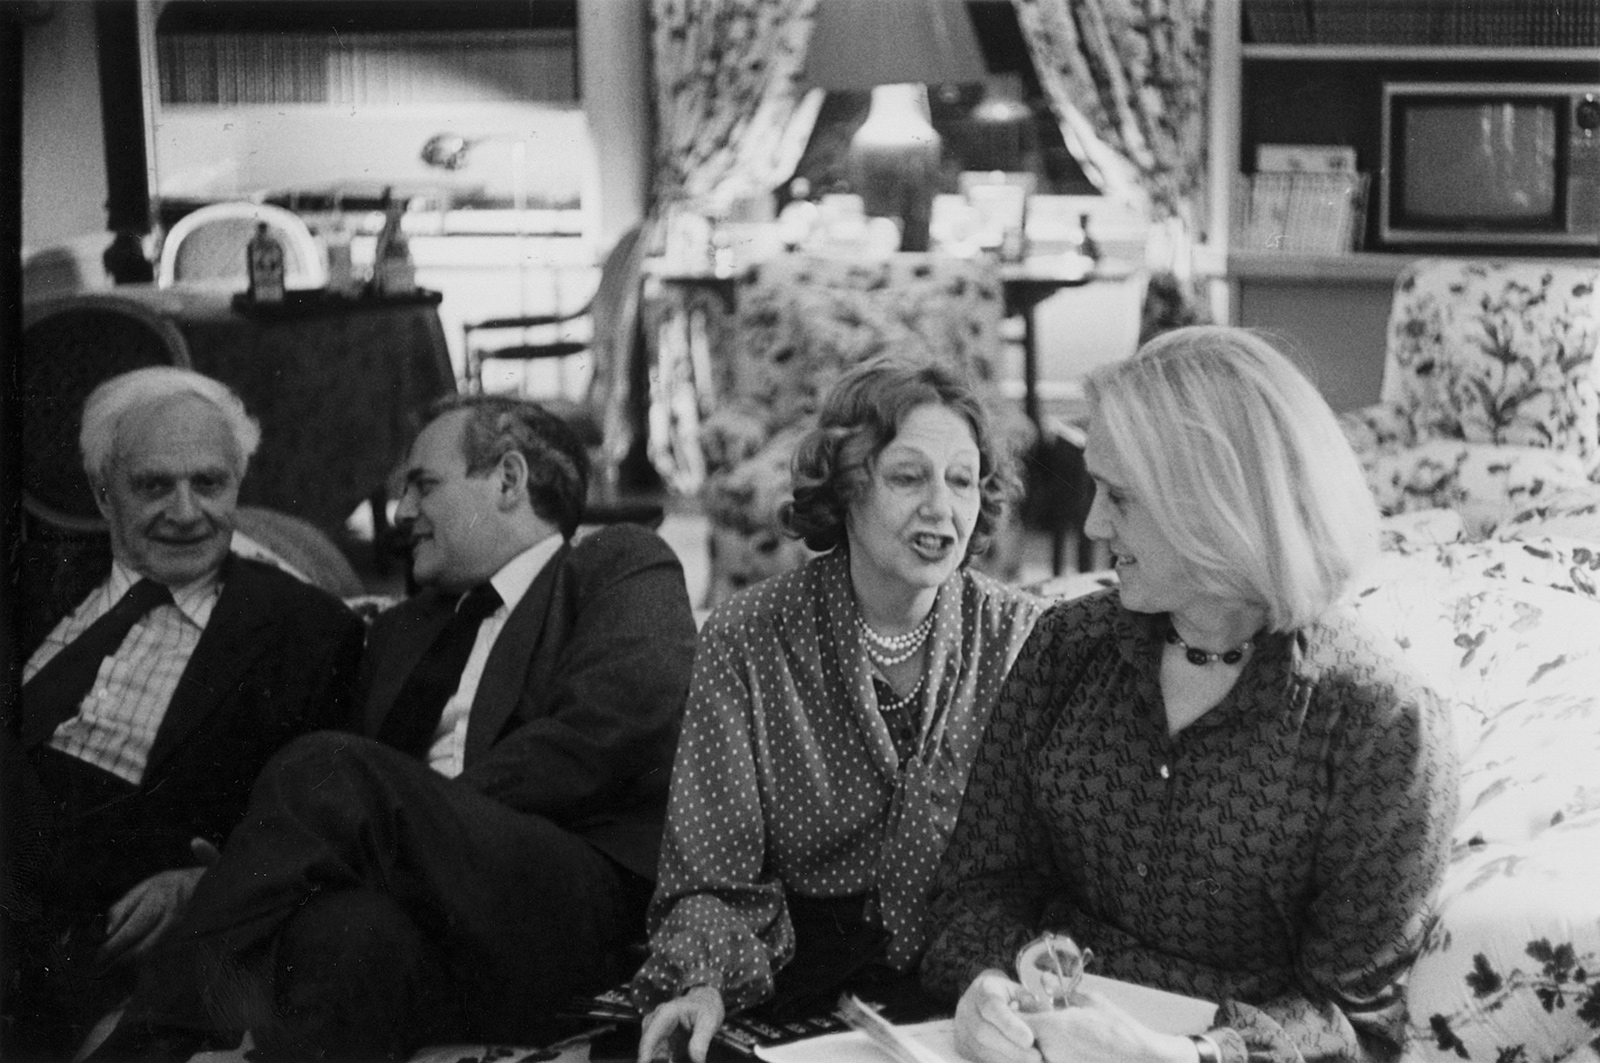 Stephen Spender, New York Review editor Robert Silvers, Elizabeth Hardwick, and Natasha Spender, New York City, 1980s